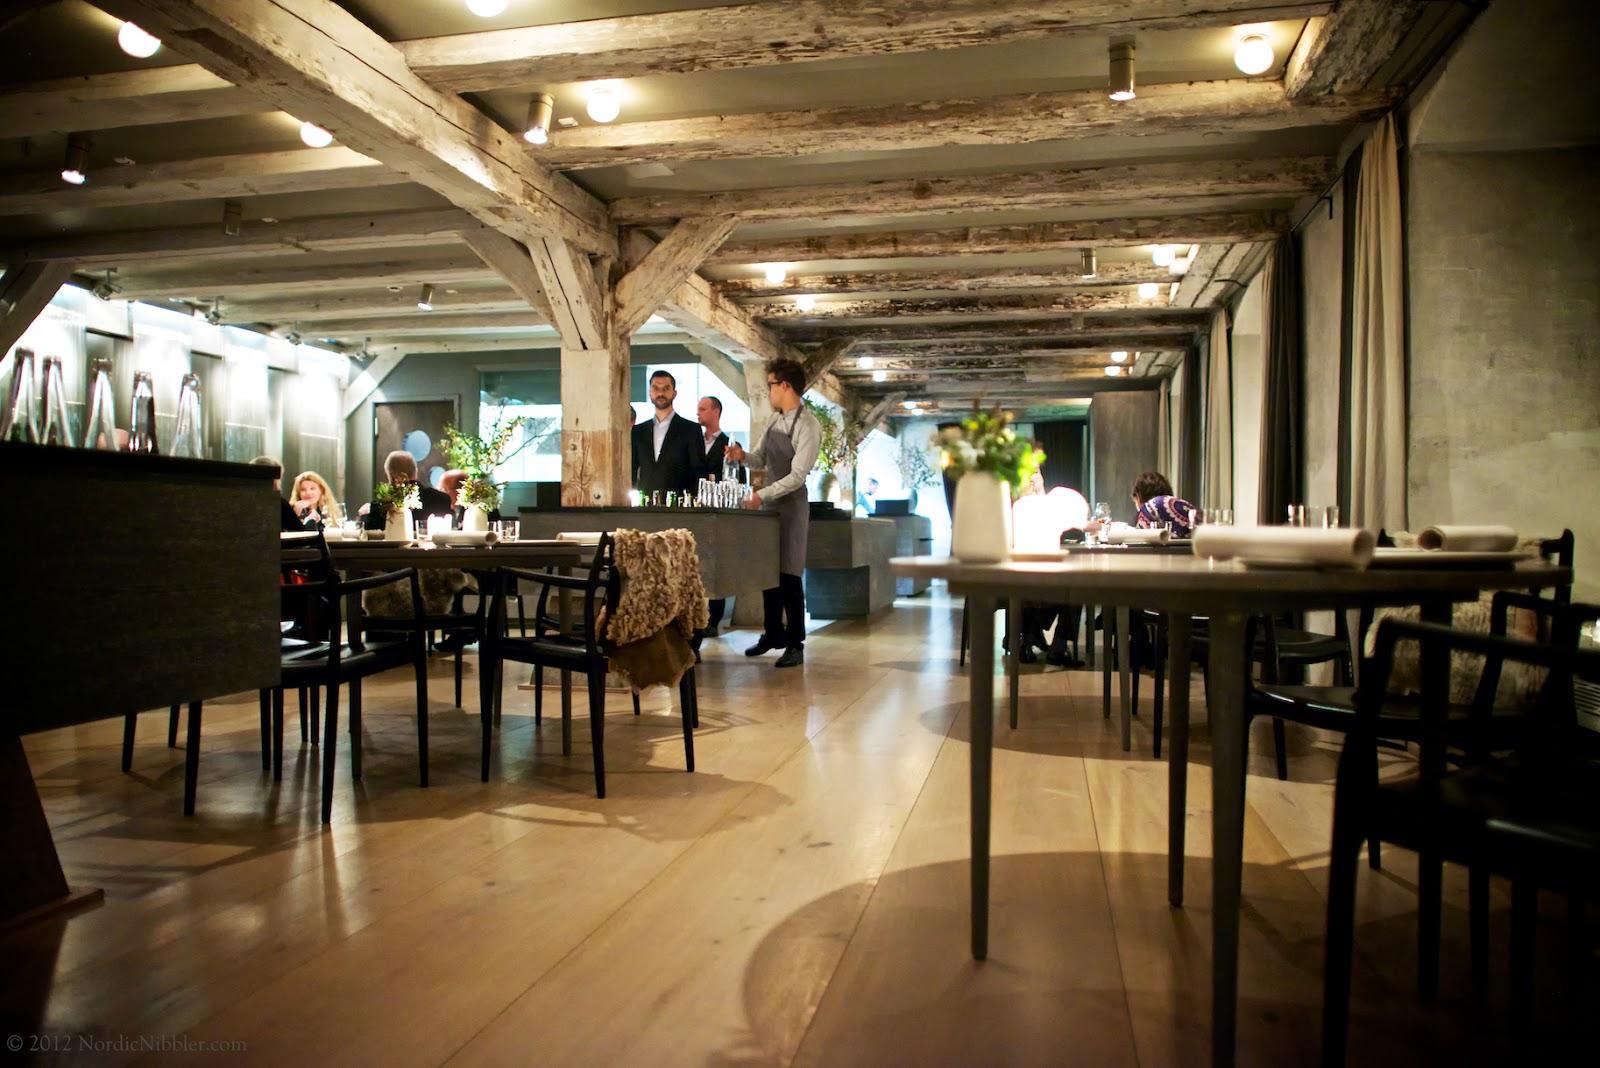 Resultado de imagen para noma restaurant